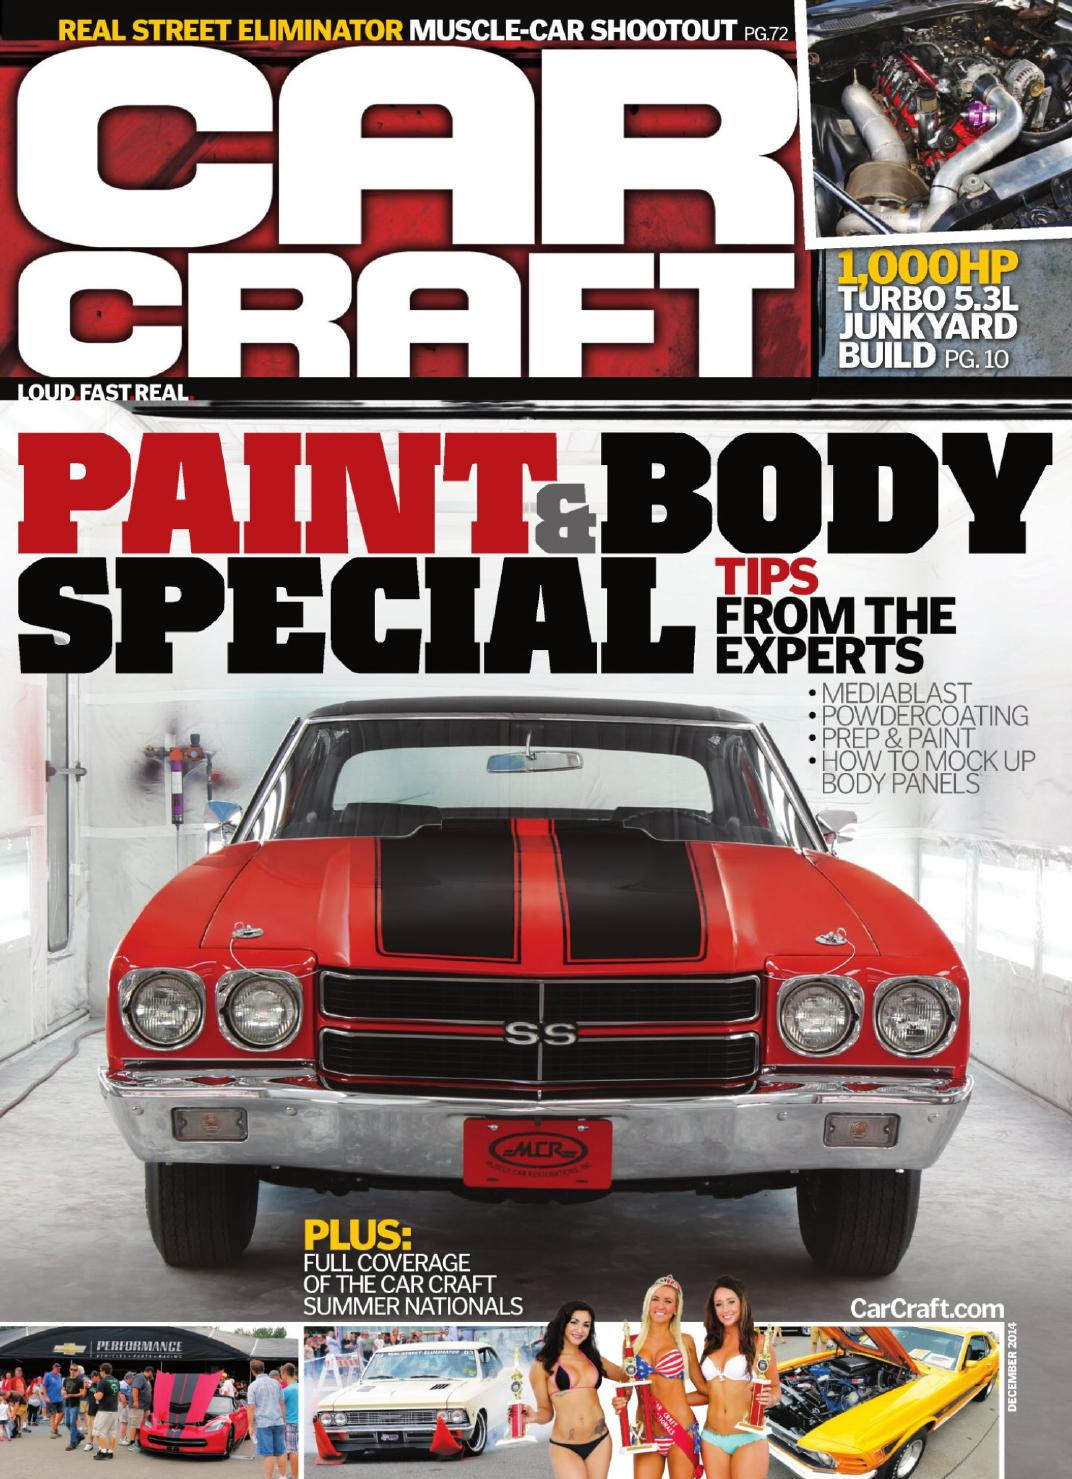 Unique Free Muscle Car Magazines Crest - Classic Cars Ideas - boiq.info